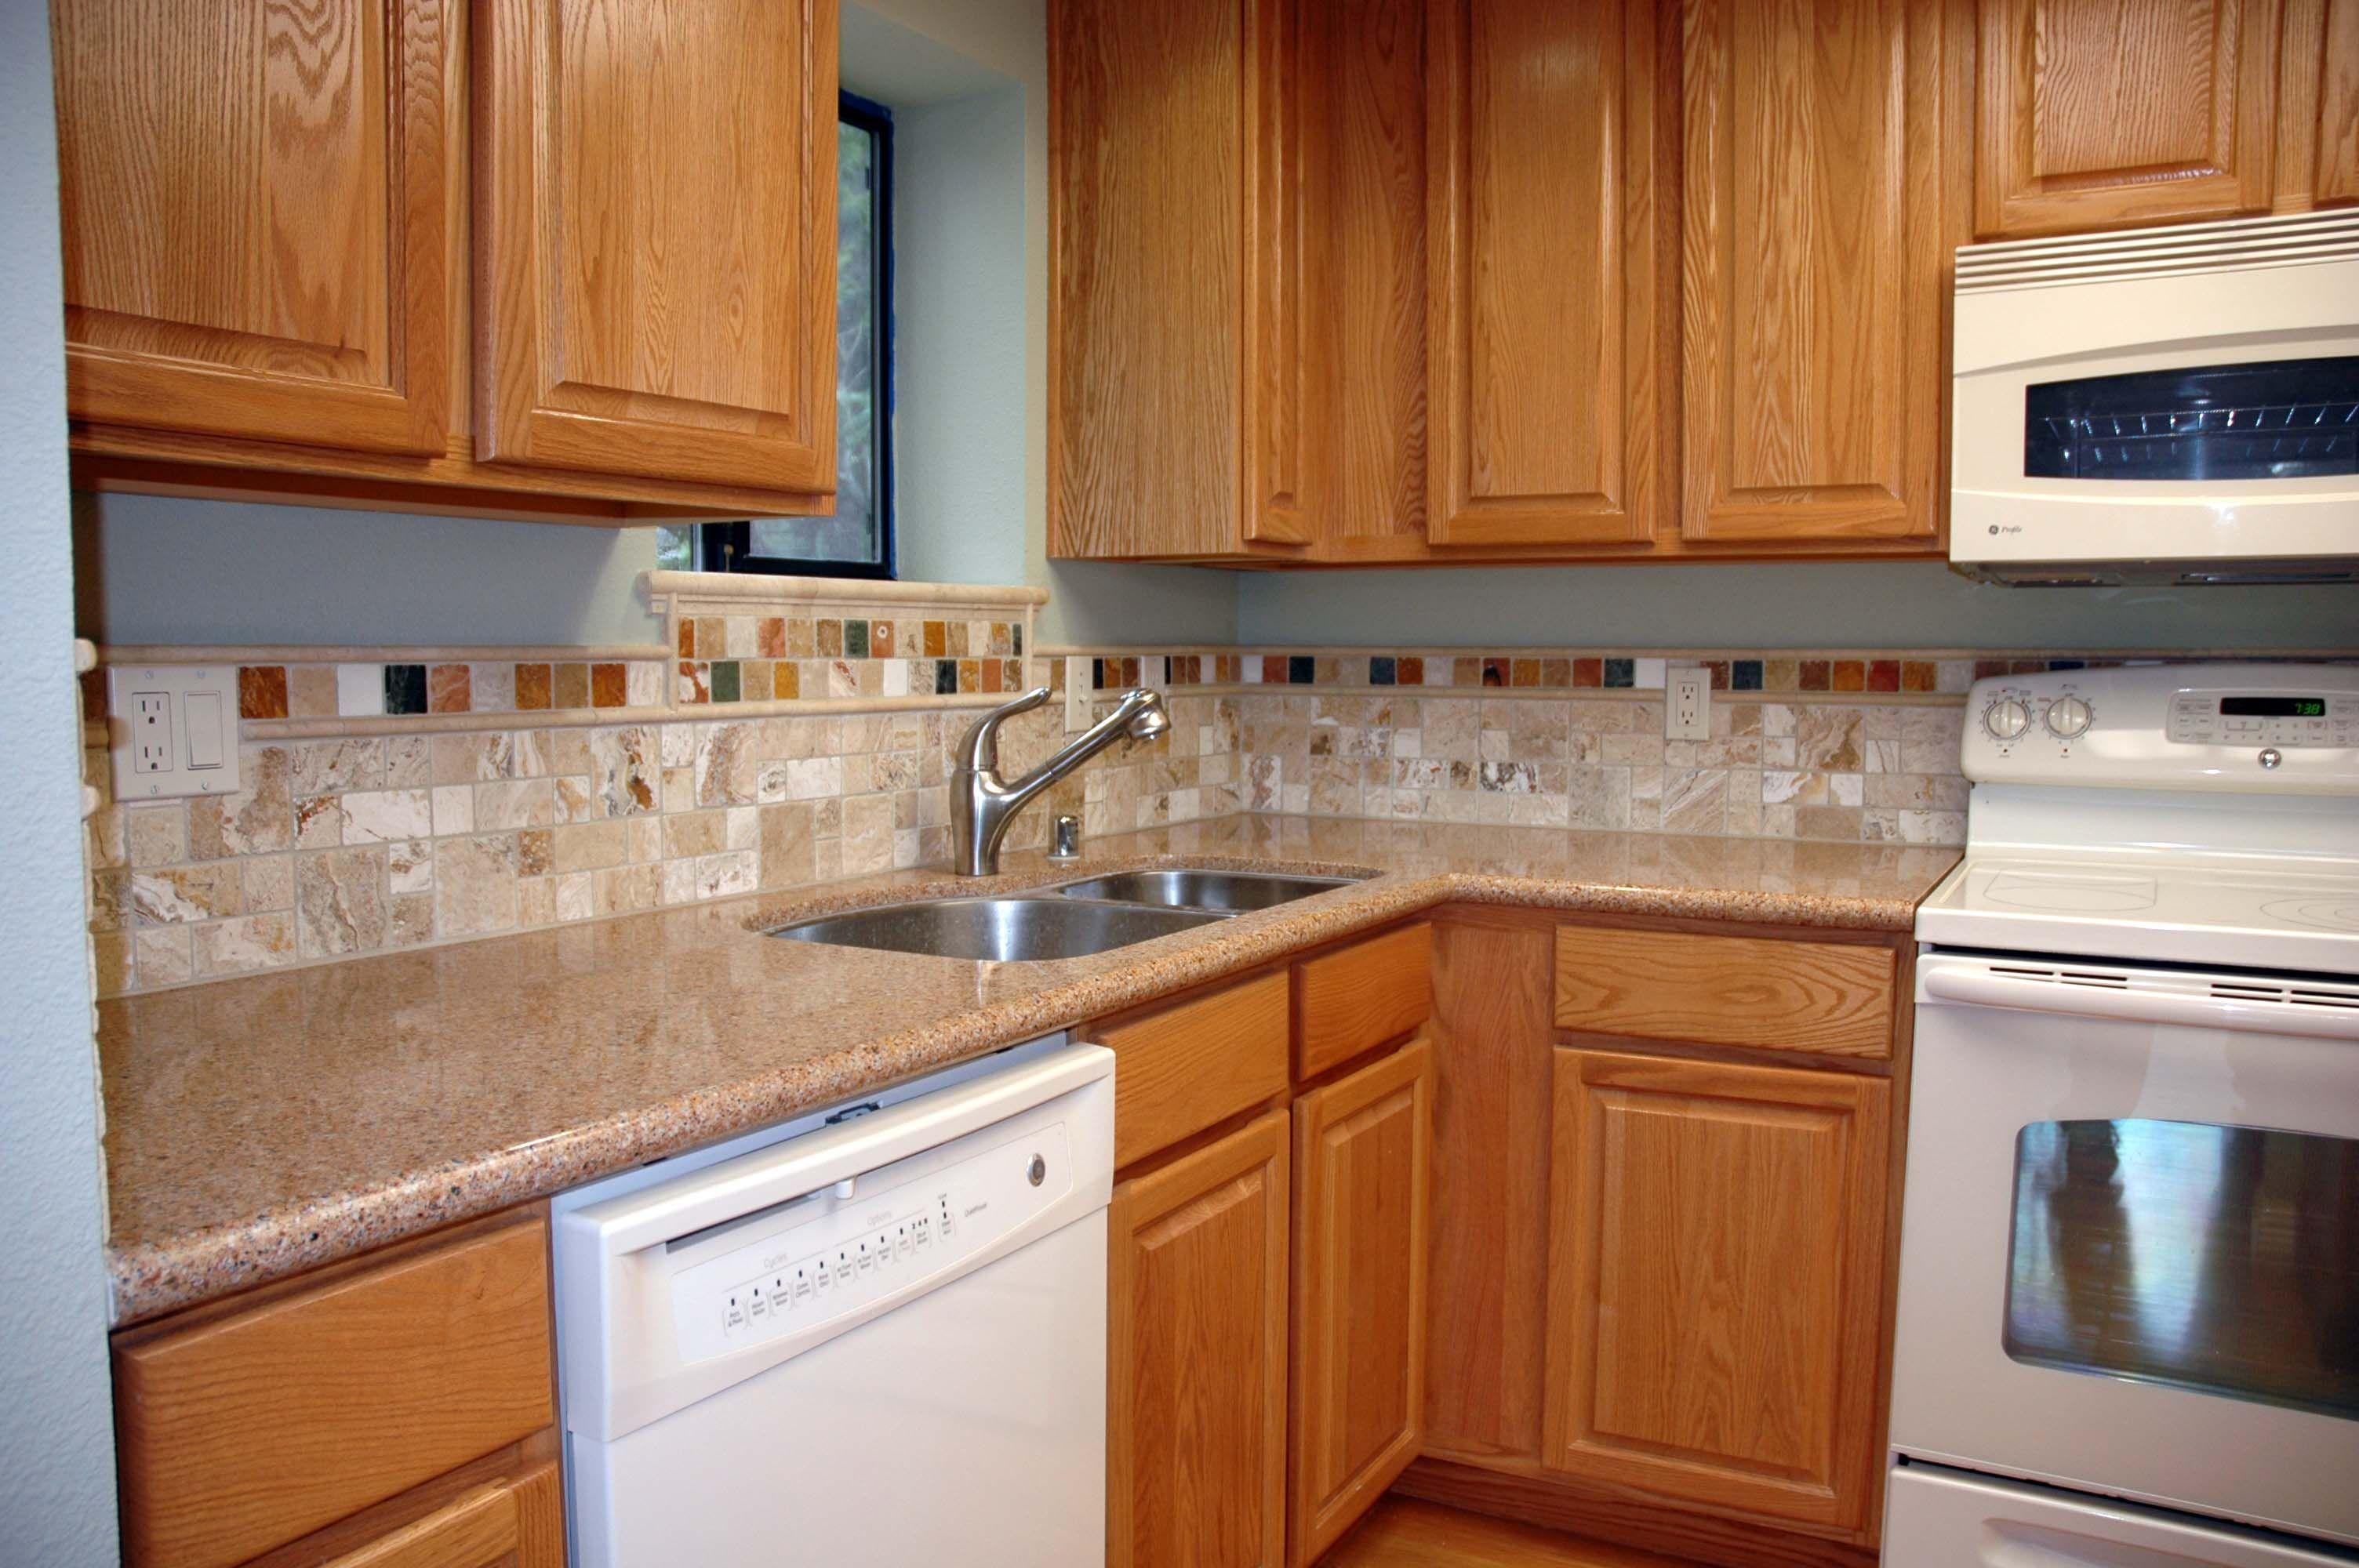 Kitchen Backsplash Ideas With Oak Cabinets backsplash for kitchen with honey oak cabinets - google search